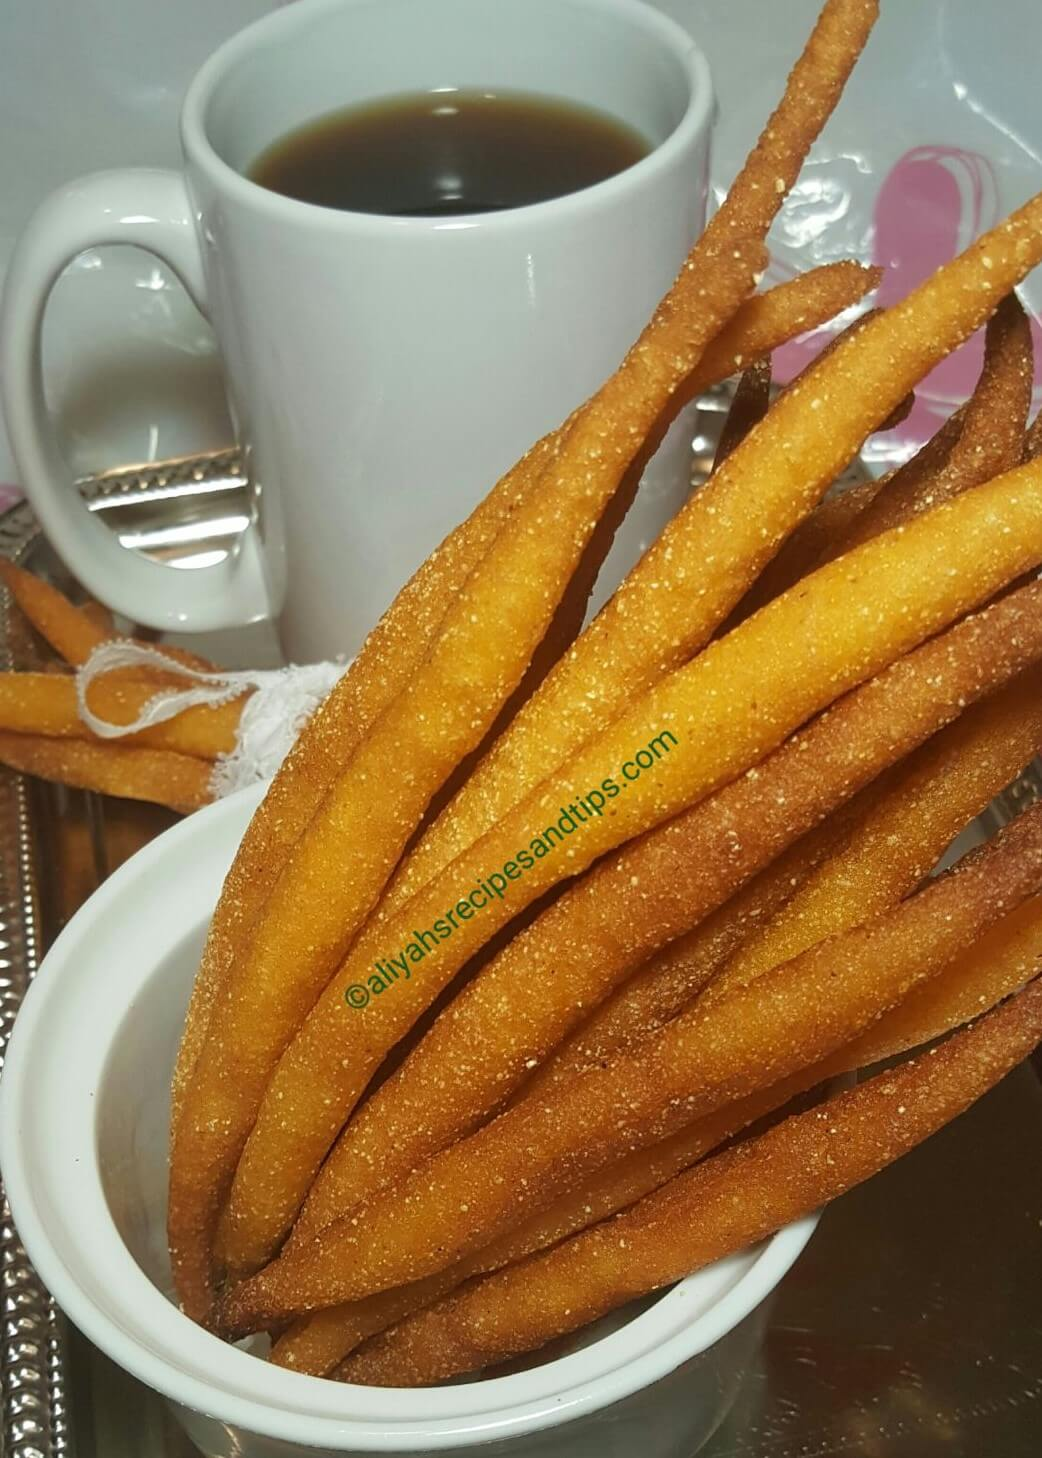 nigerian kokoro recipe, chin chin, corn meal, Nigerian food, snacks, abeokuta, masa, garri, crunchy meal, 9jafoodie, mosa, nigerian kokoro recipe, kokoro, African snacks, korokoro, adunlee, tanfiri,mosa, honey kokoro, Nigerian kokoro, cheesey garlic kokoro, kokoro kokoro kokoro, crunchy Nigerian snacks